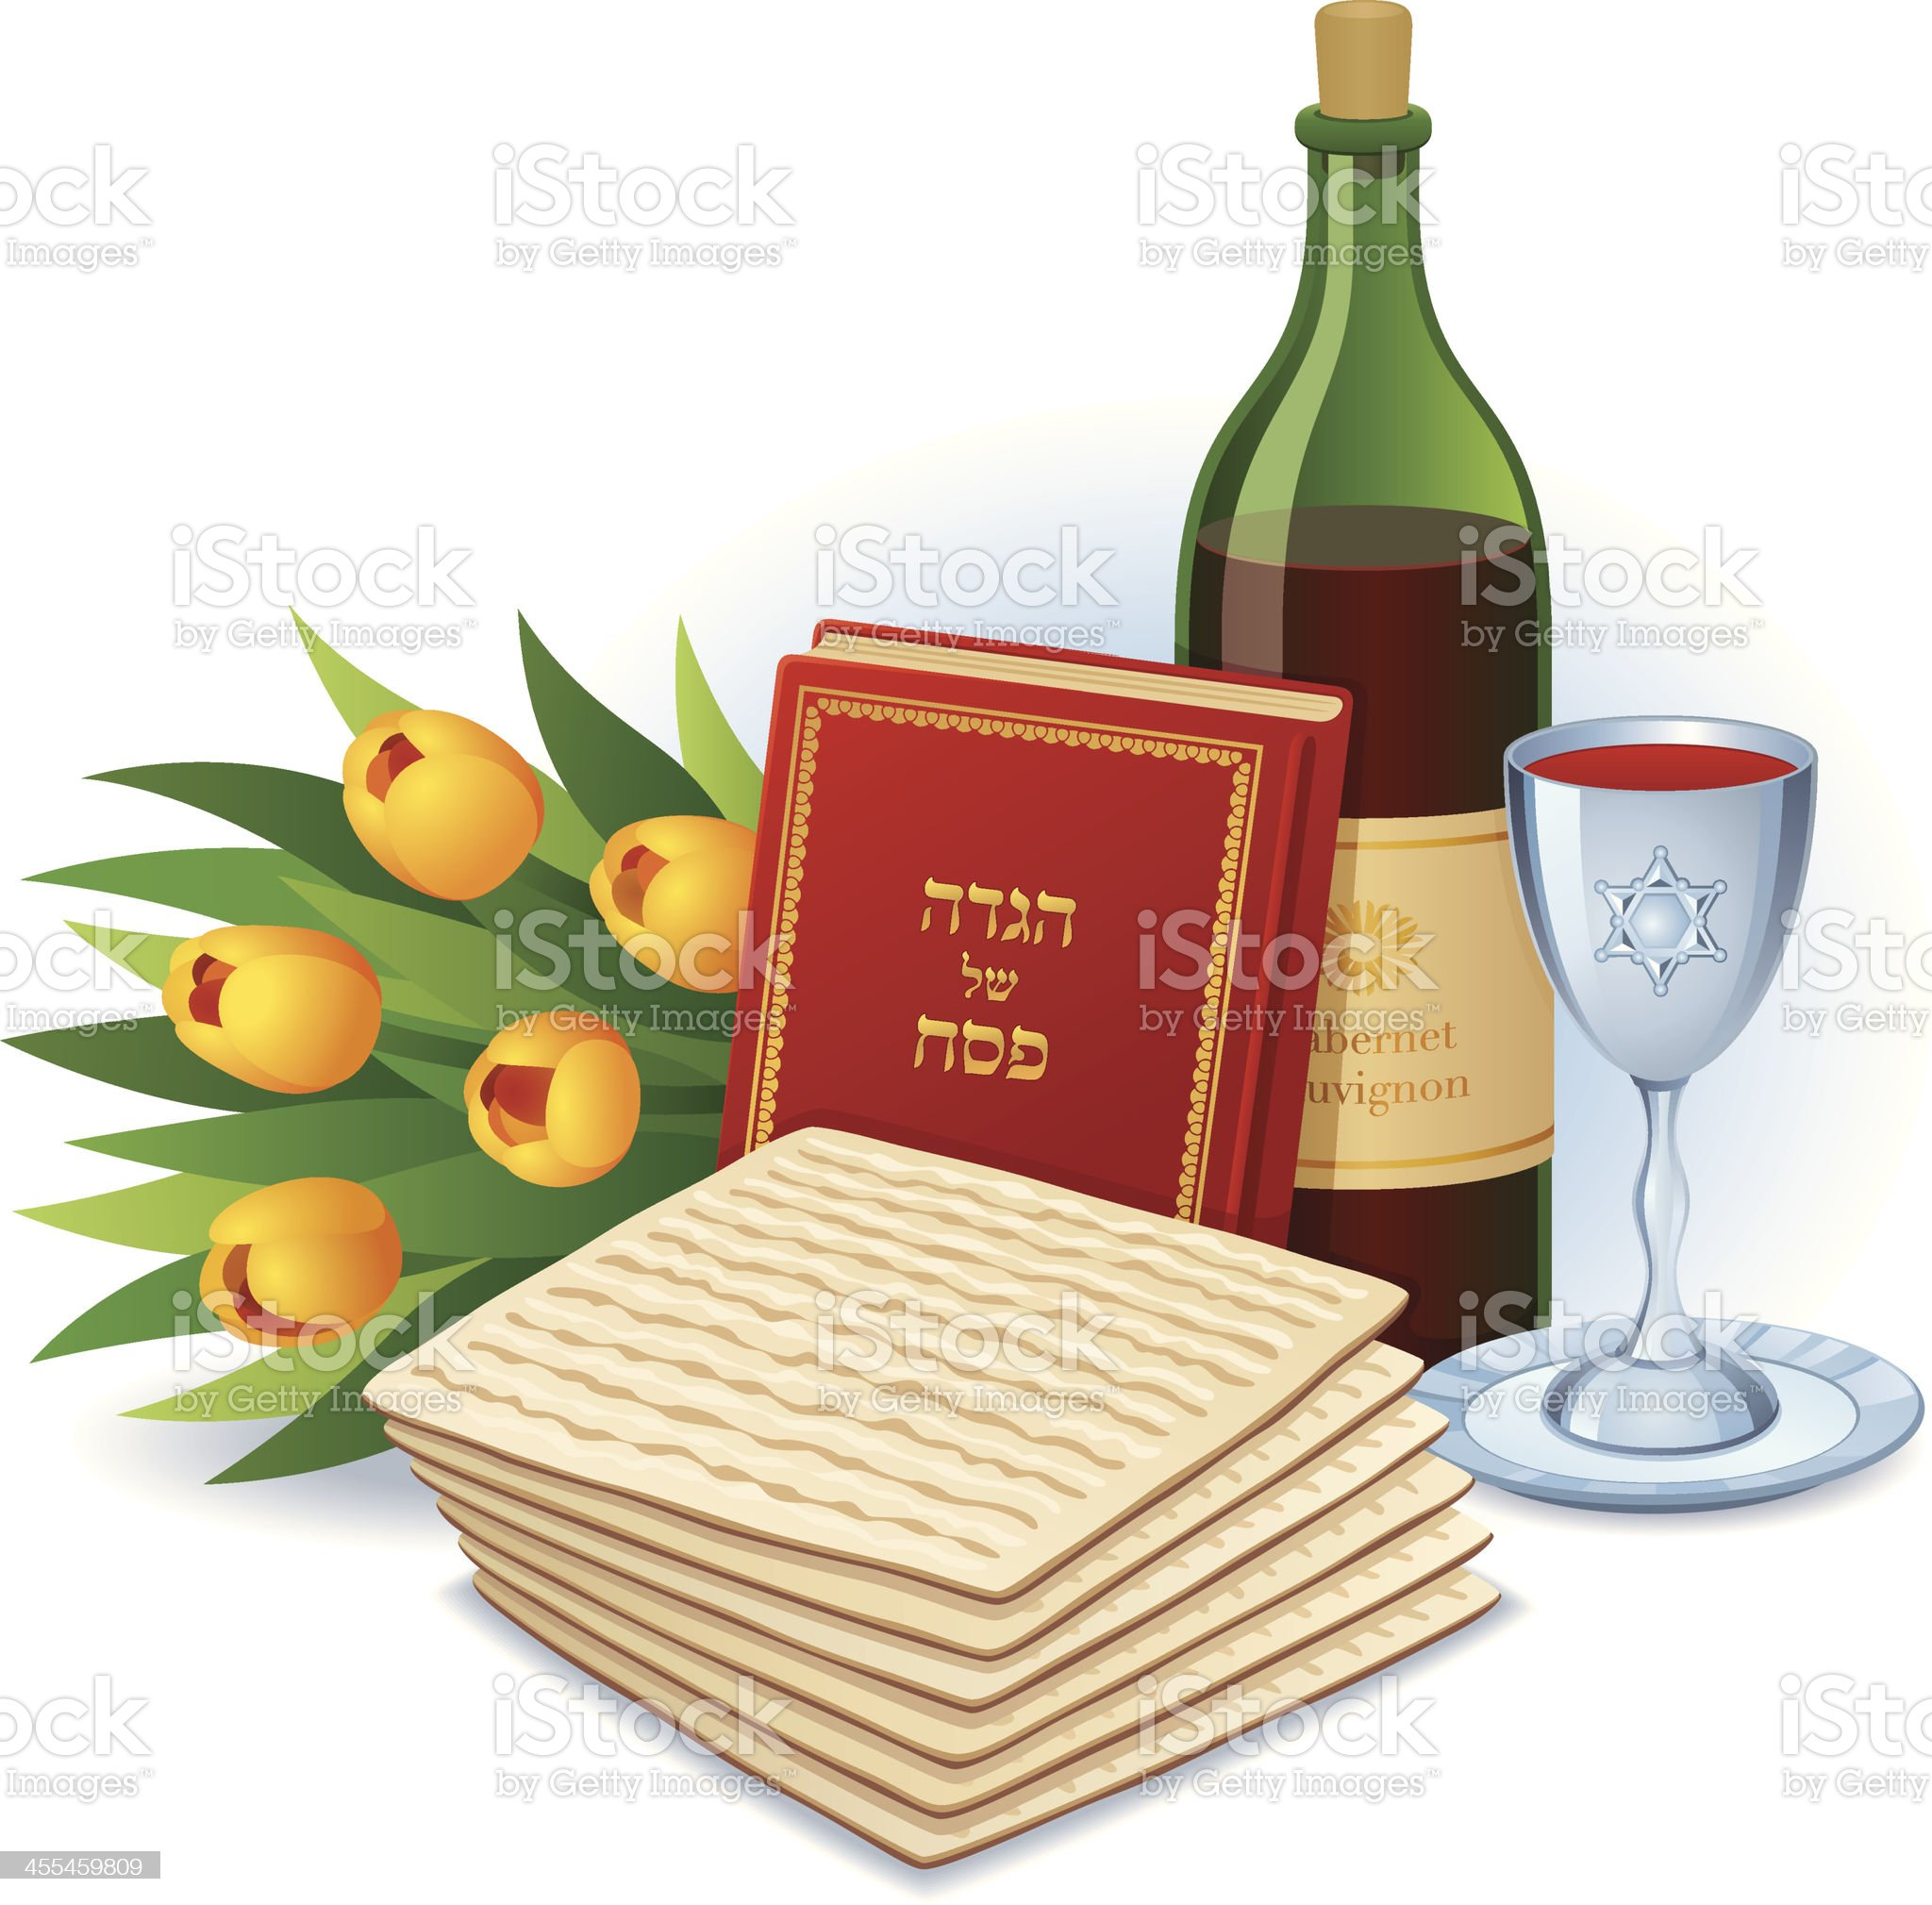 Happy Passover royalty-free stock vector art